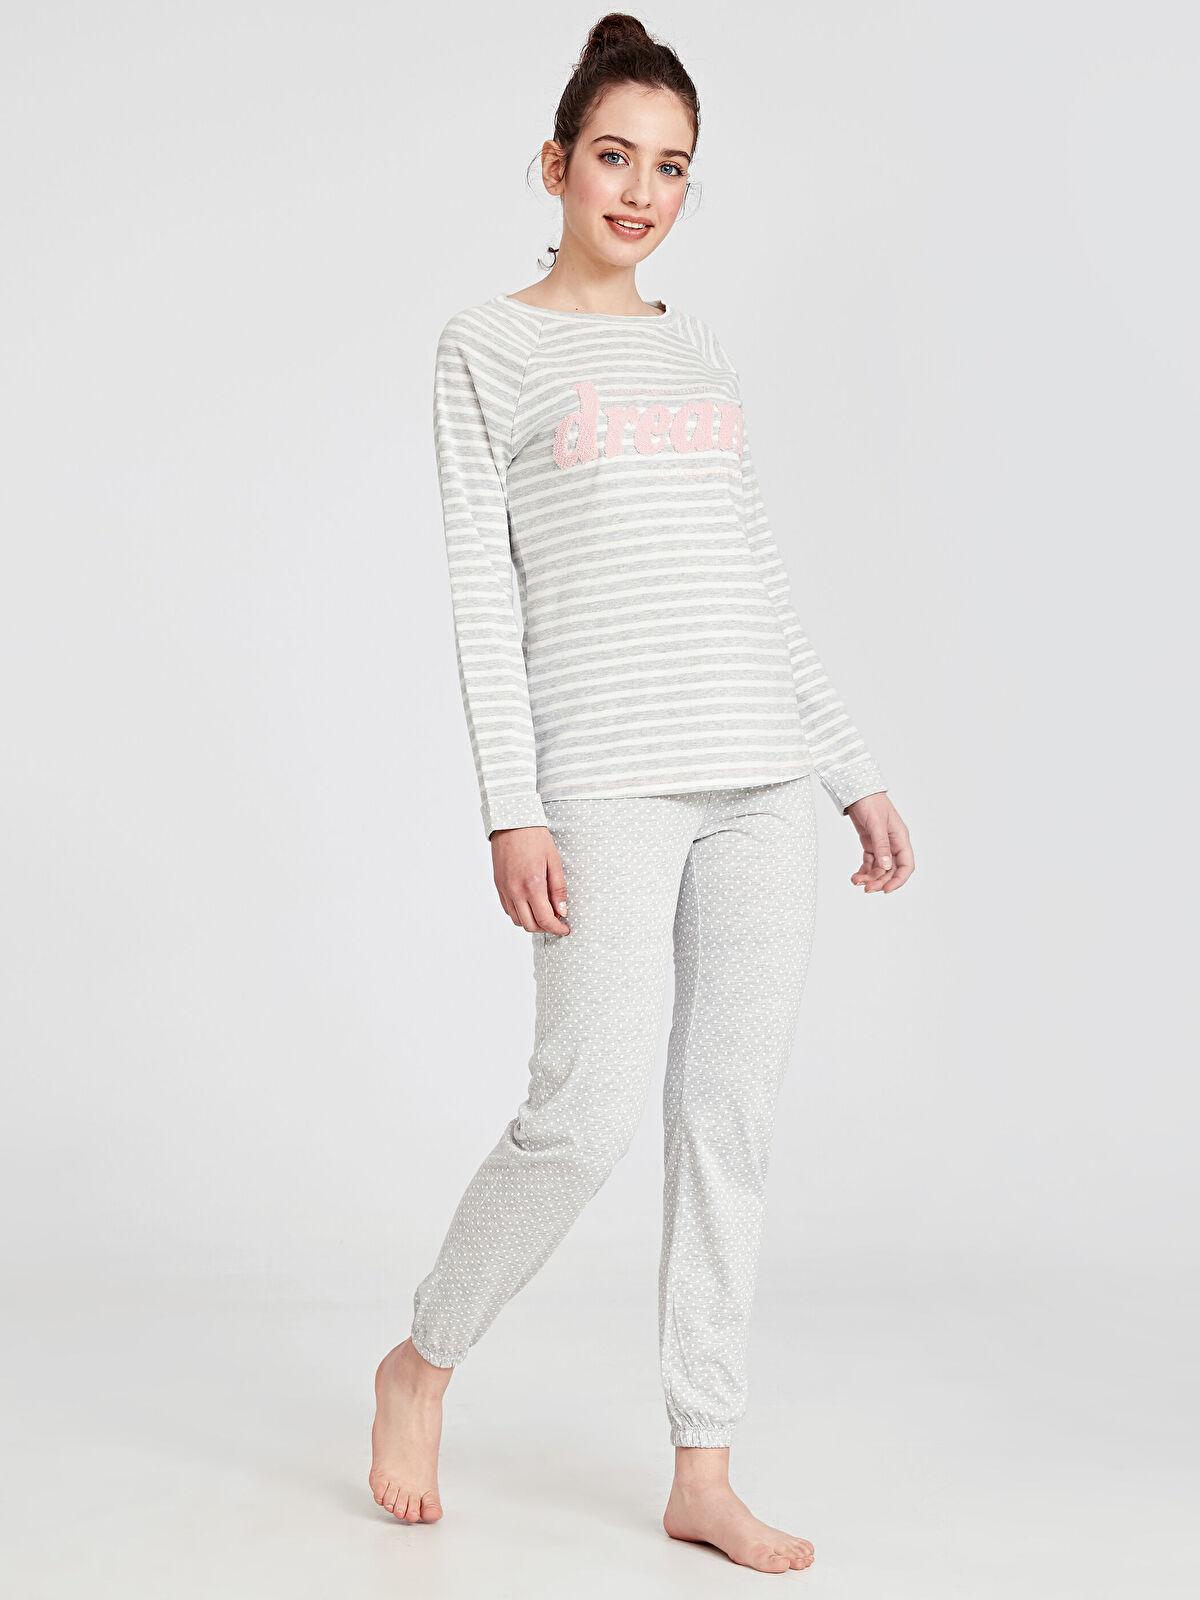 Nakışlı Çizgili Pijama Takımı - LC WAIKIKI